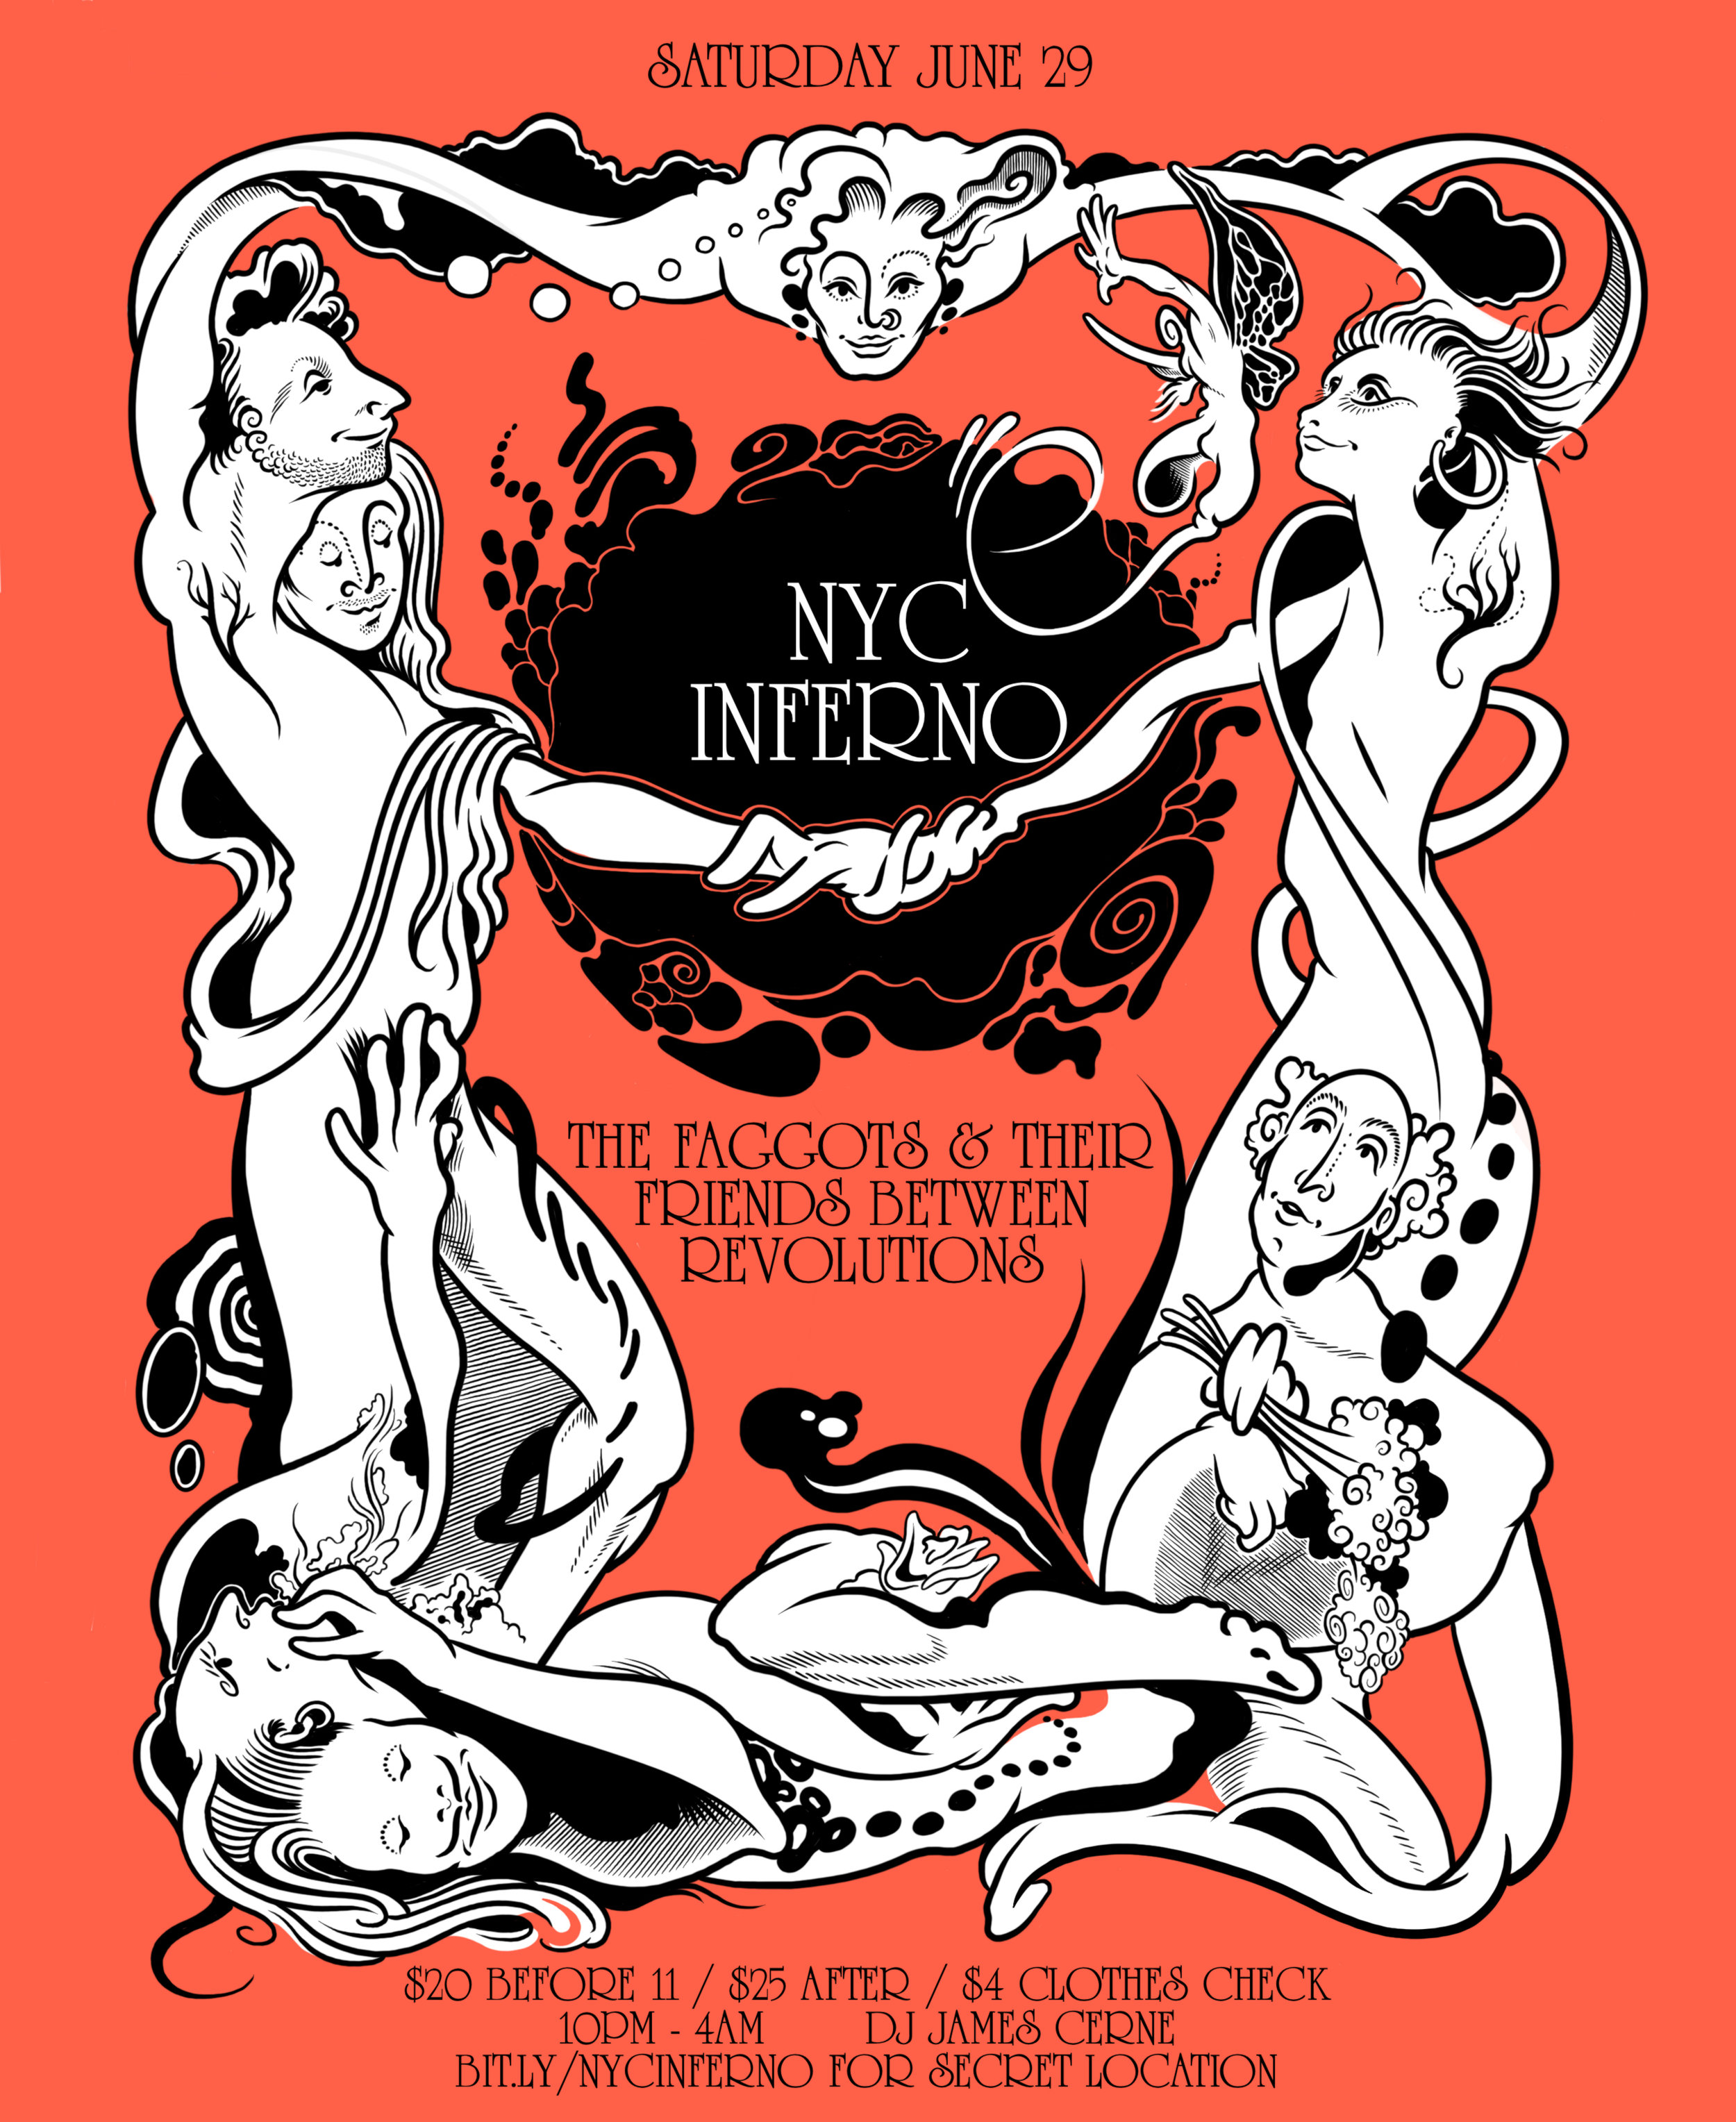 NYC_Inferno_Revolutions.jpg